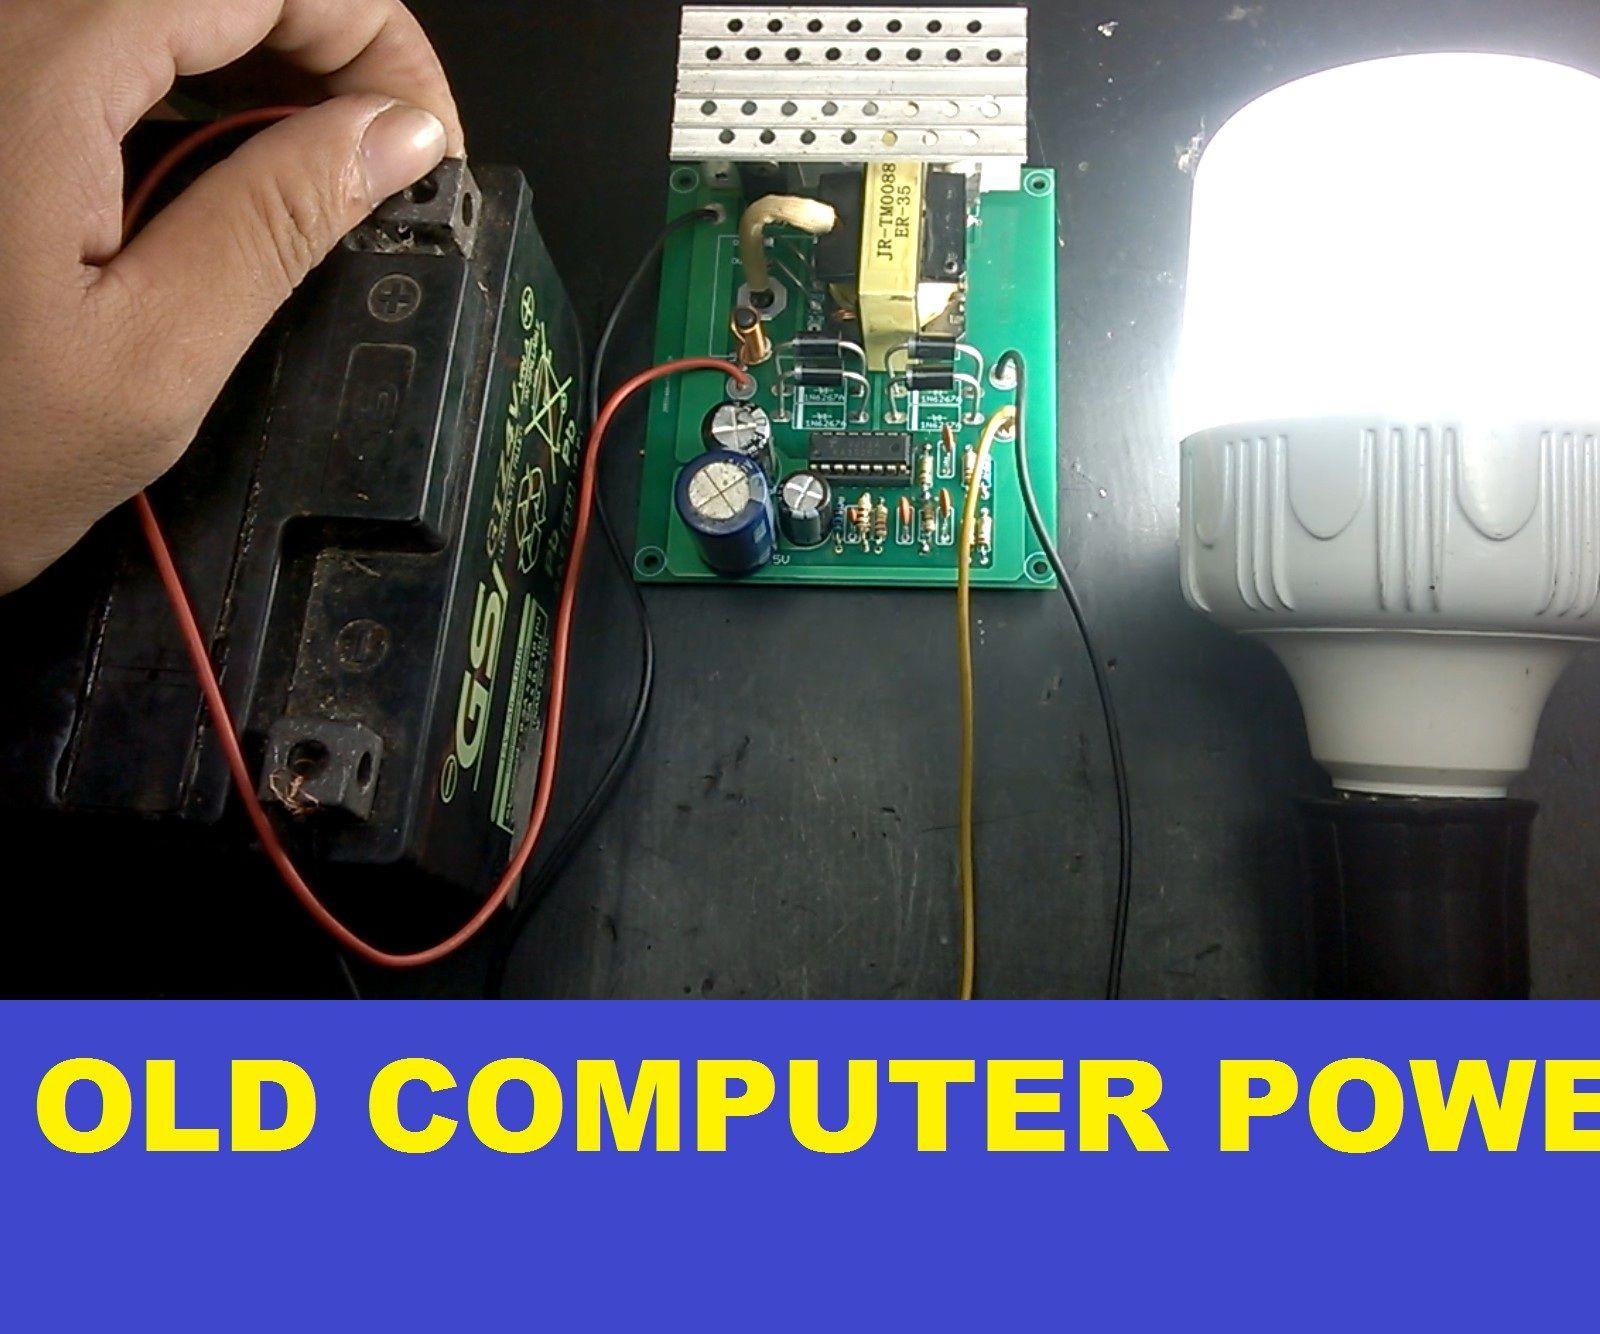 Make 350W Power Inverter 12V 220V From OLD Computer Power Supply